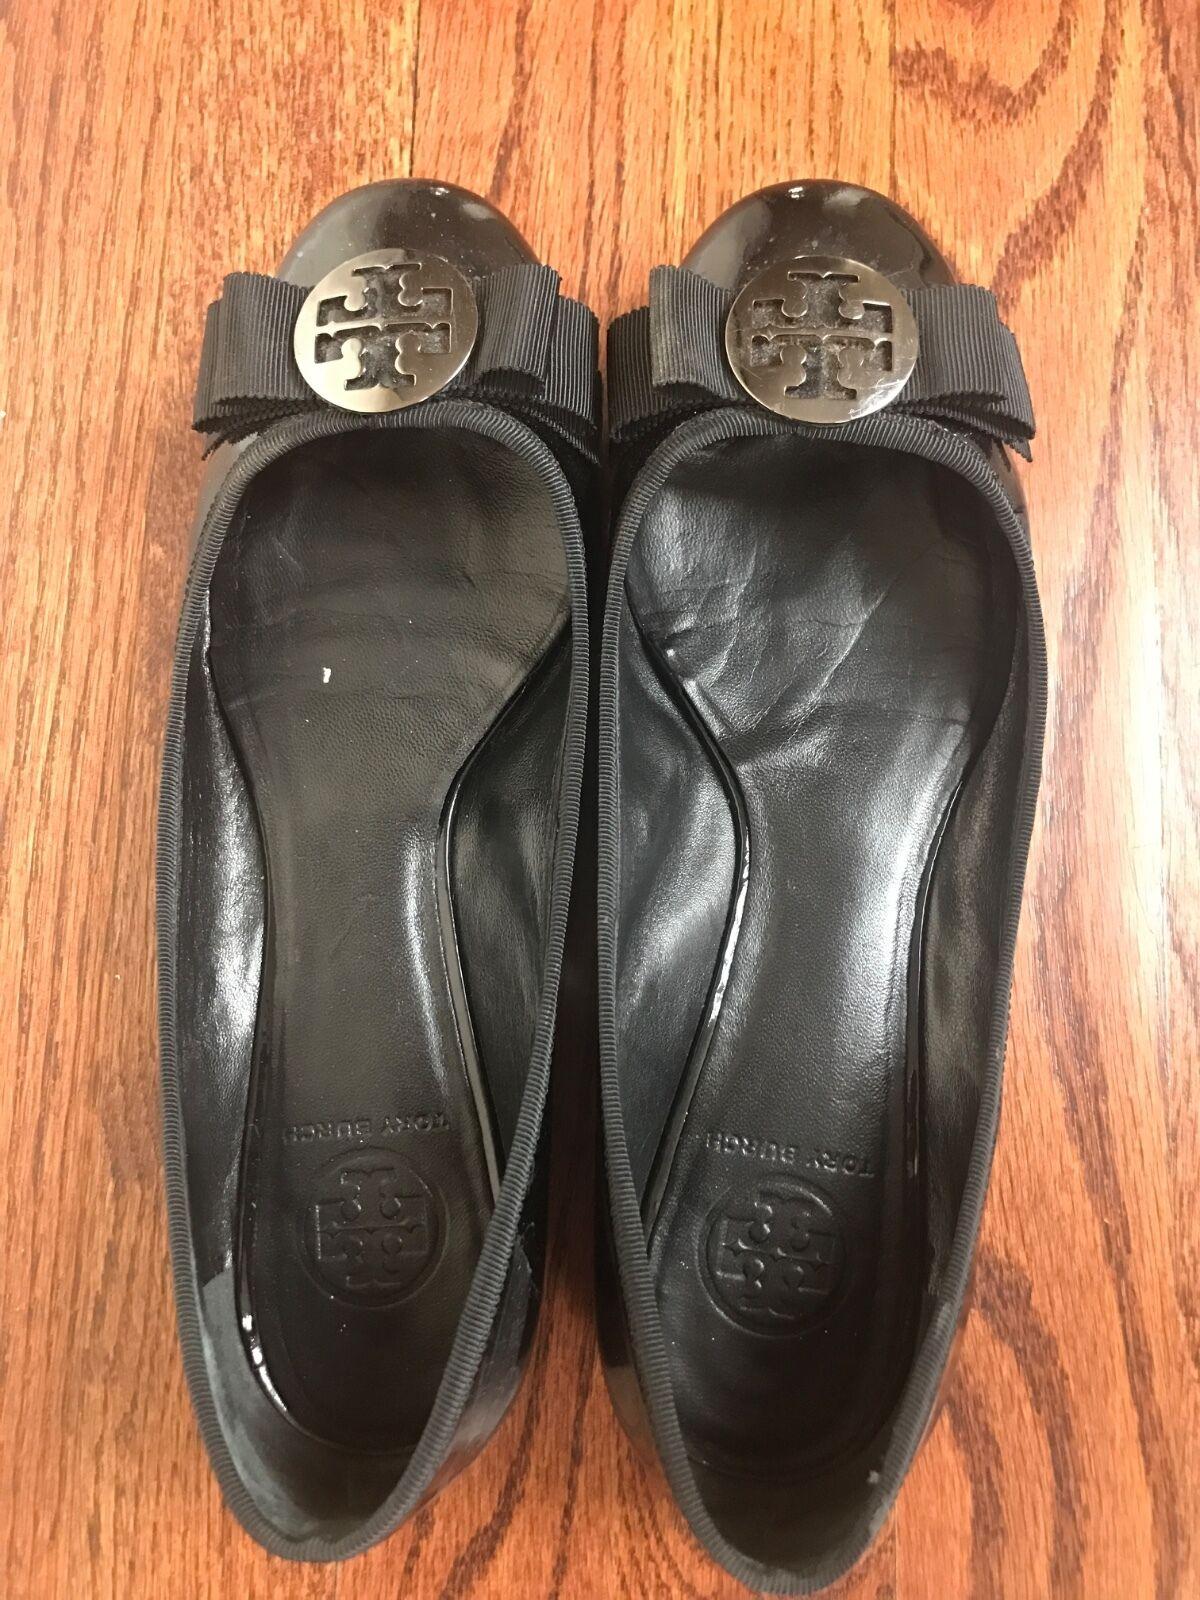 Tory Burch schwarz Größe patent Leder flat schuhe Größe schwarz 9.5 28504f